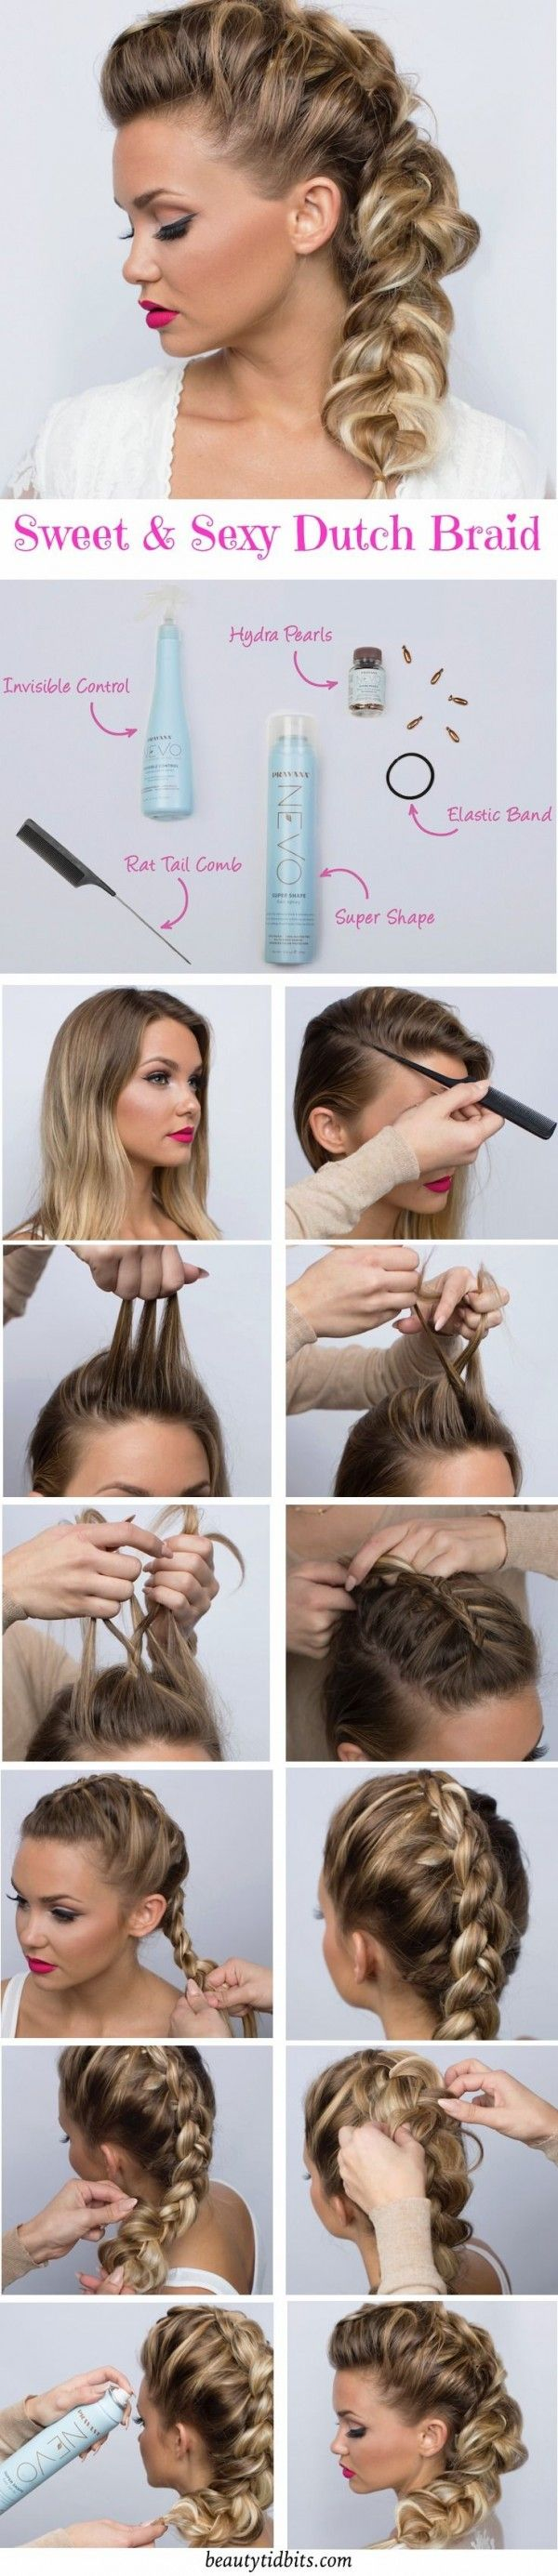 night club hairstyle7